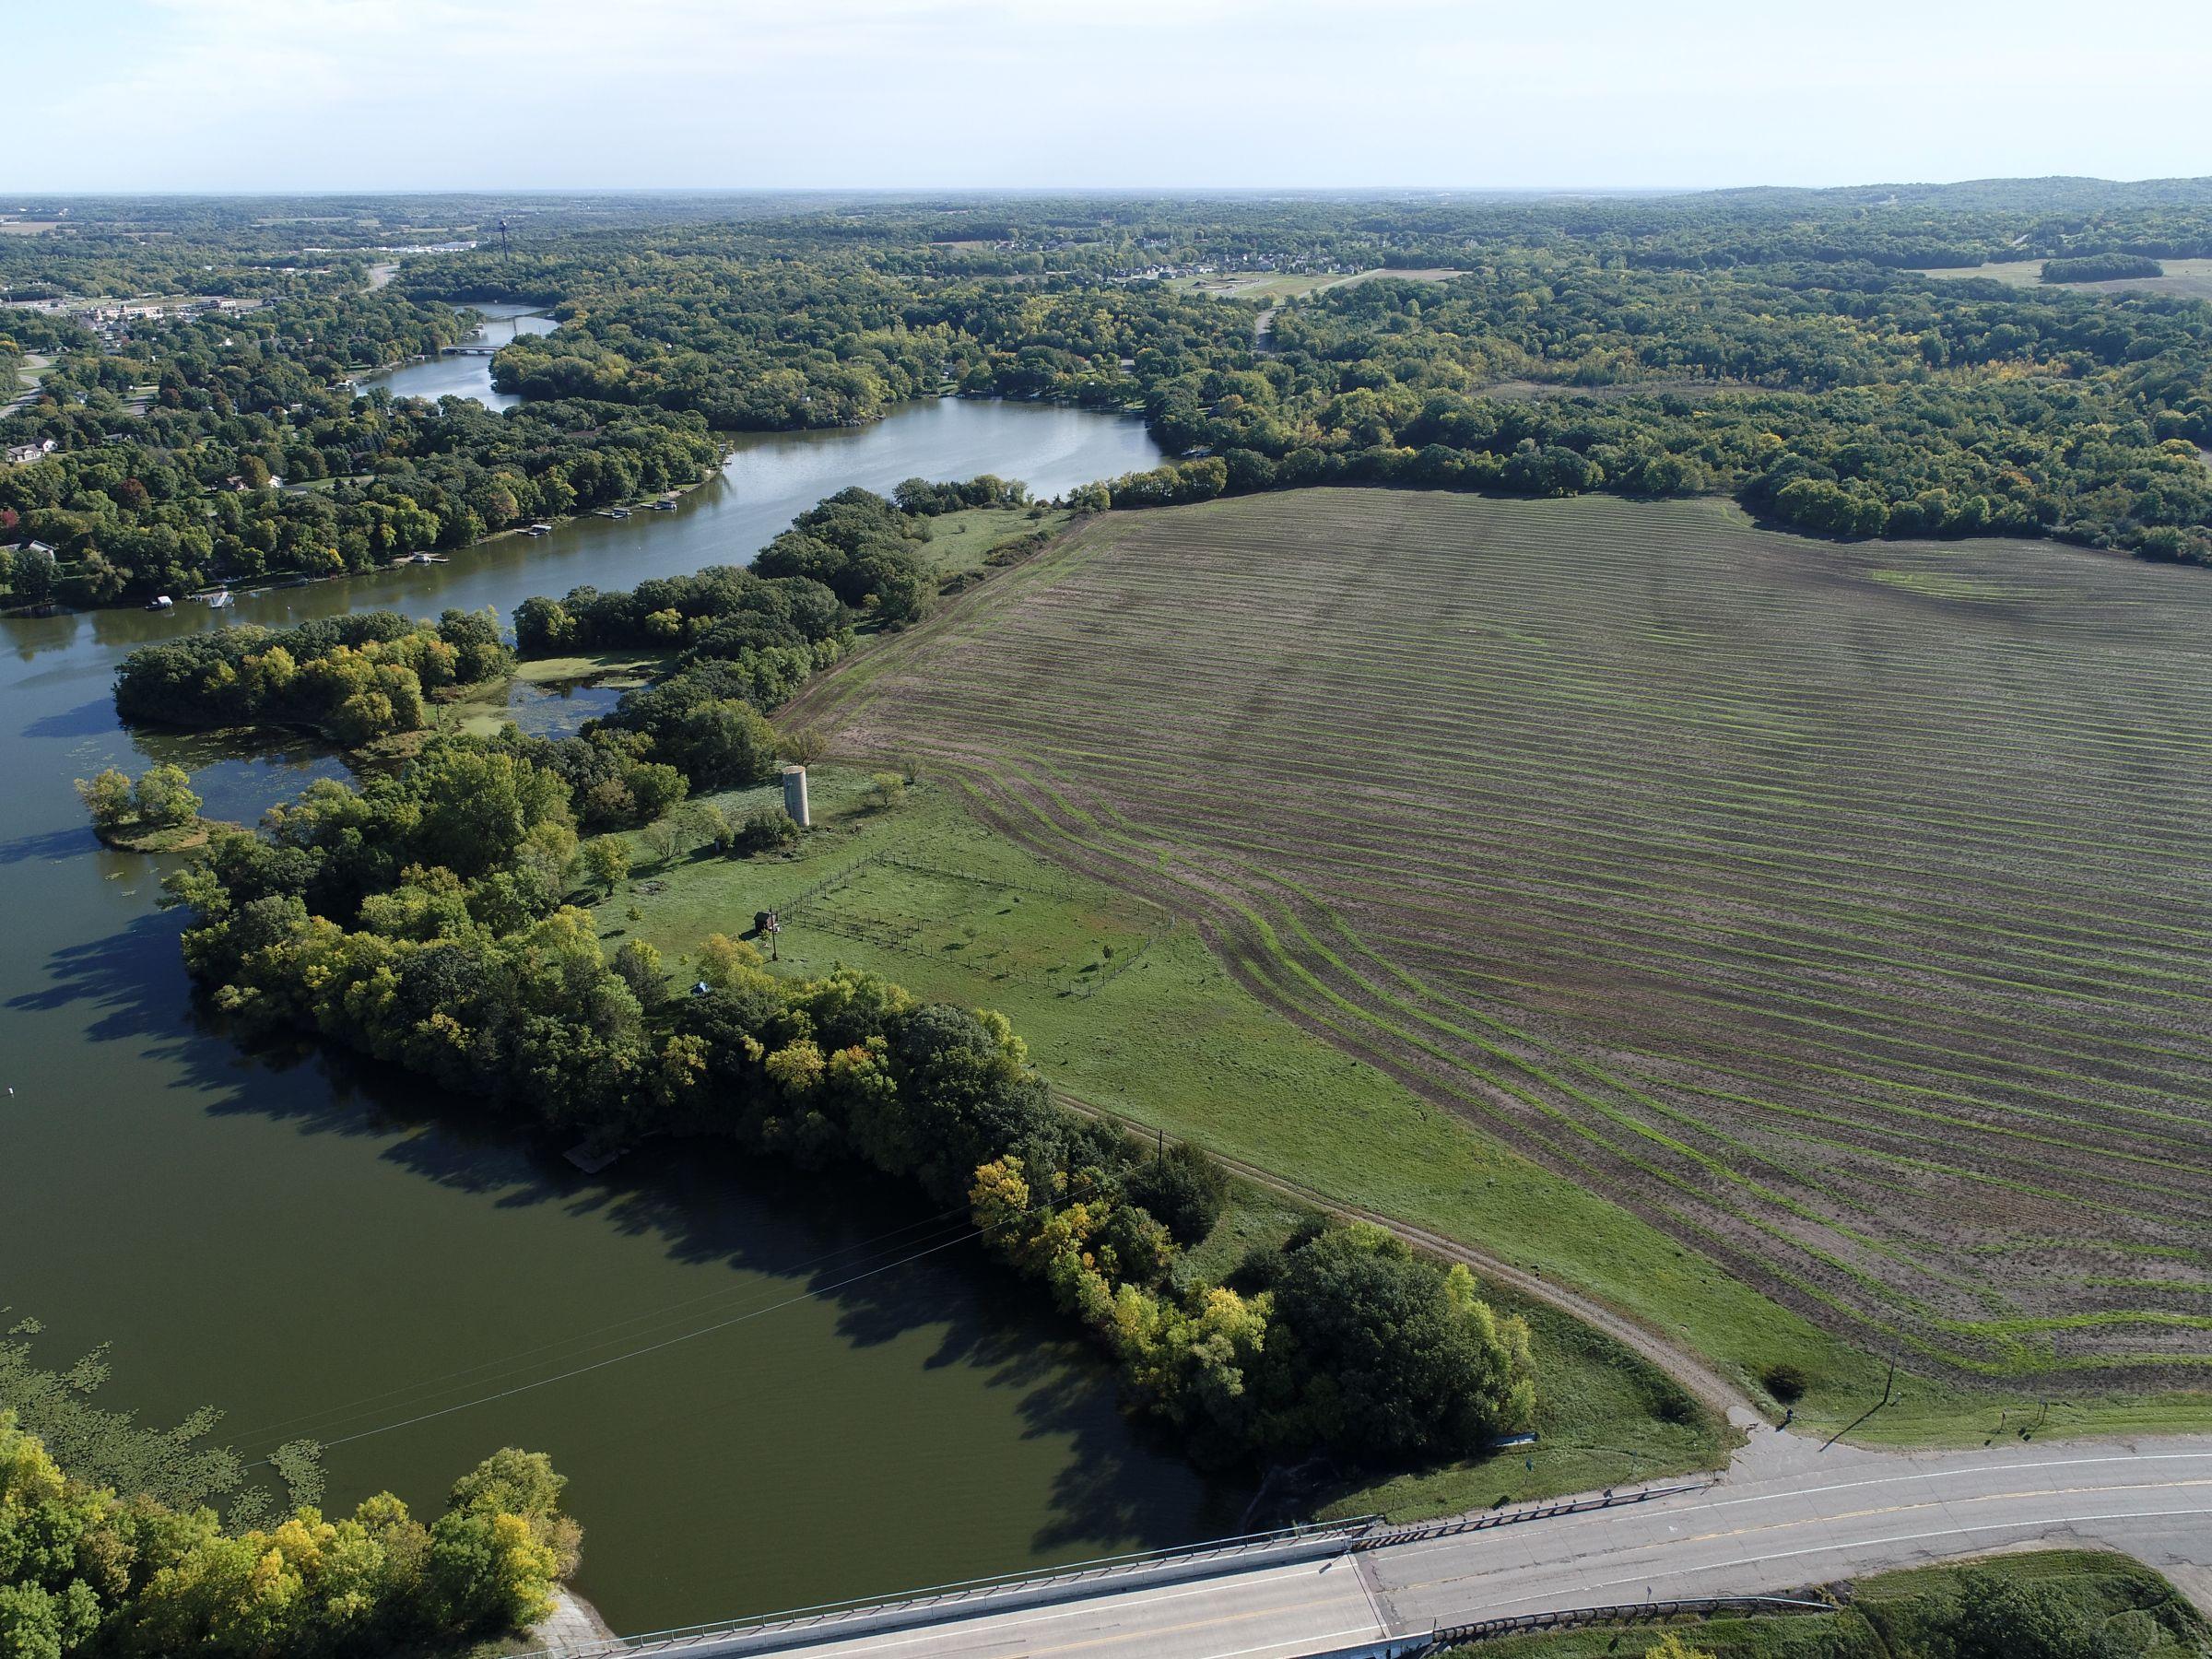 land-stearns-county-minnesota-298-acres-listing-number-15712-1-2021-09-23-125524.JPG